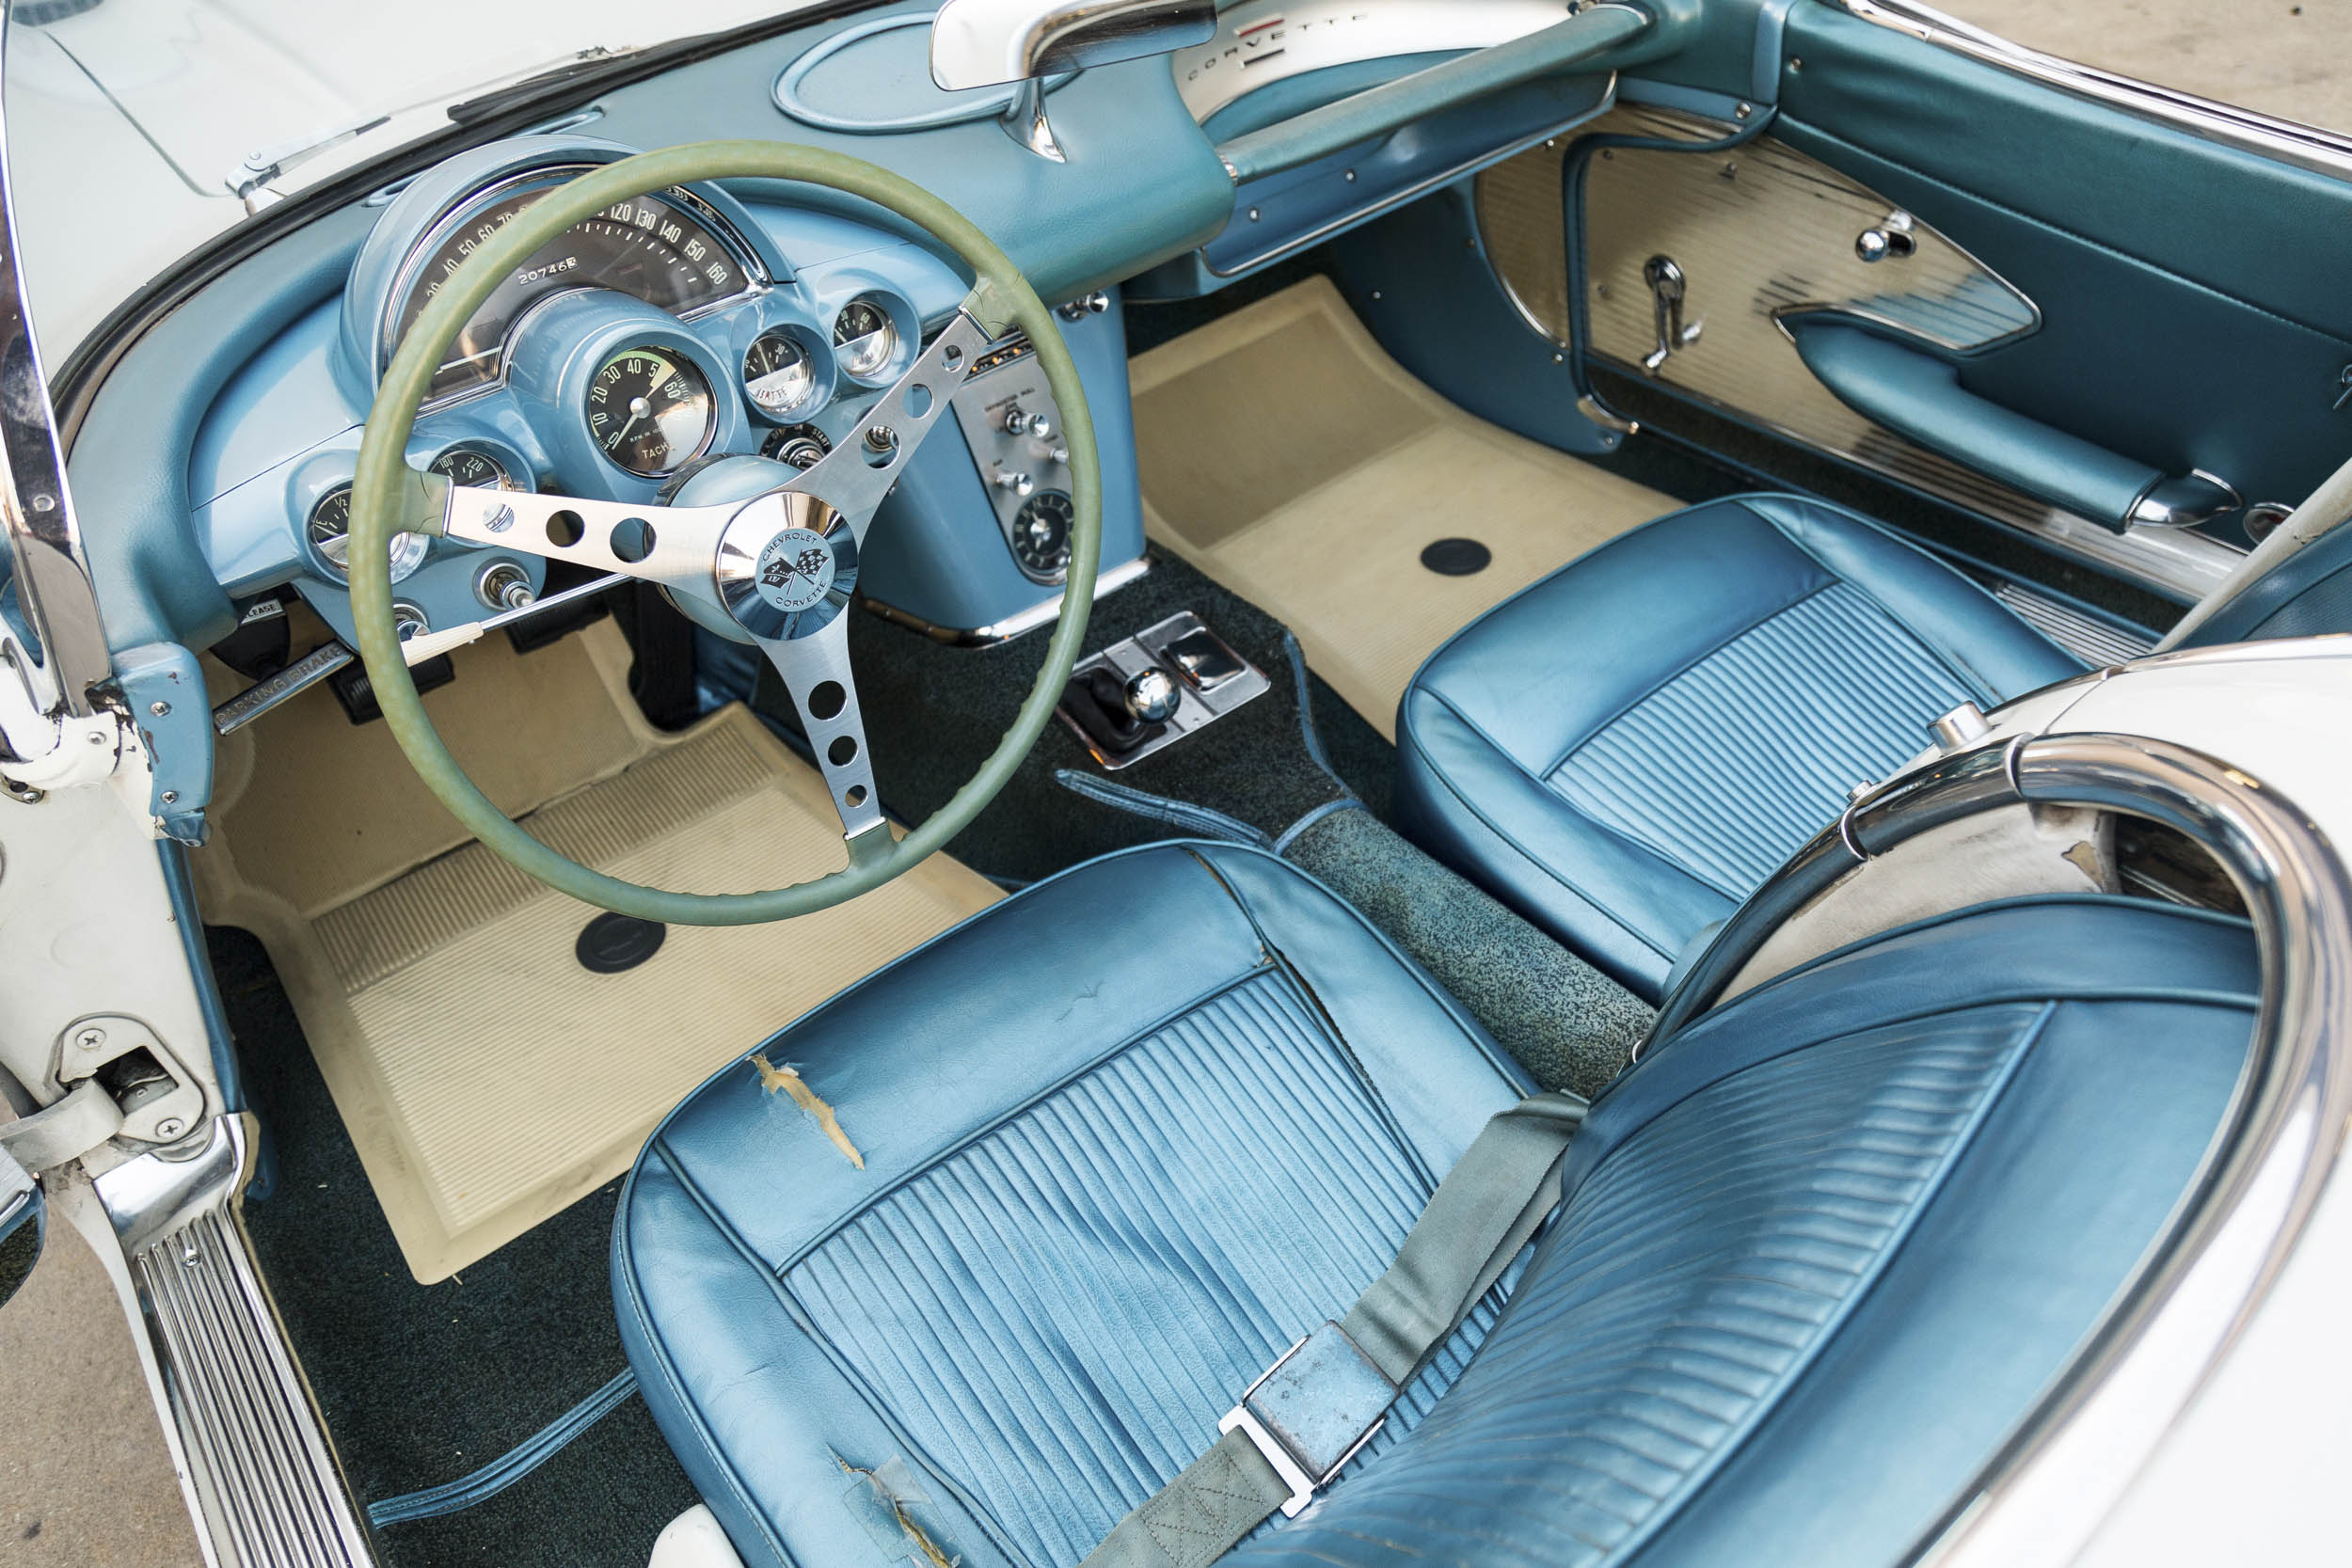 1961 Chevrolet Corvette interior